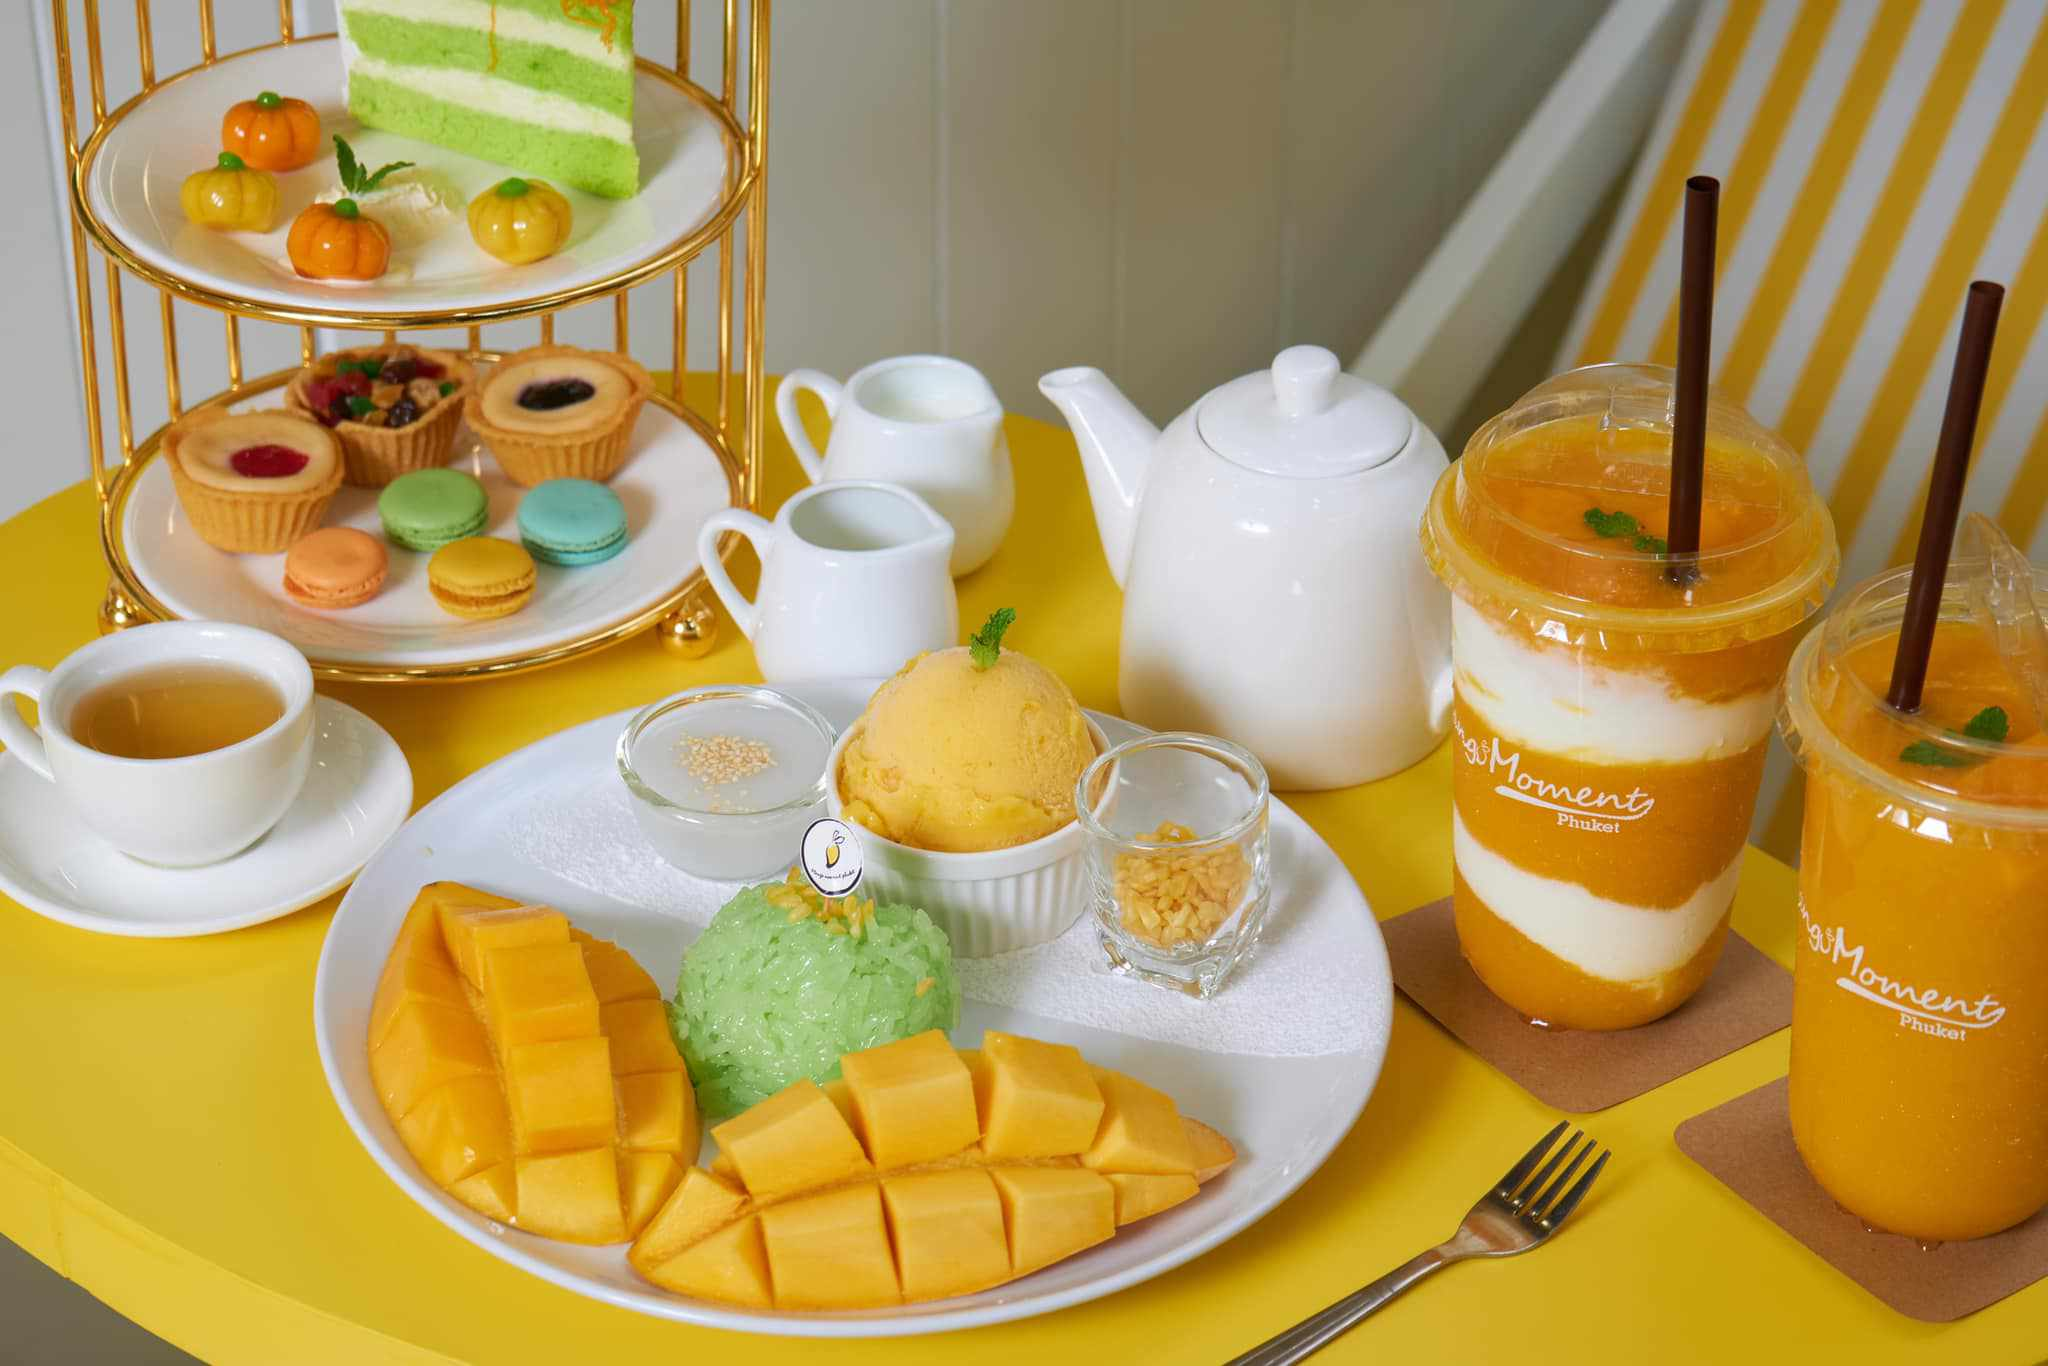 Mango Moments' mango sticky rice